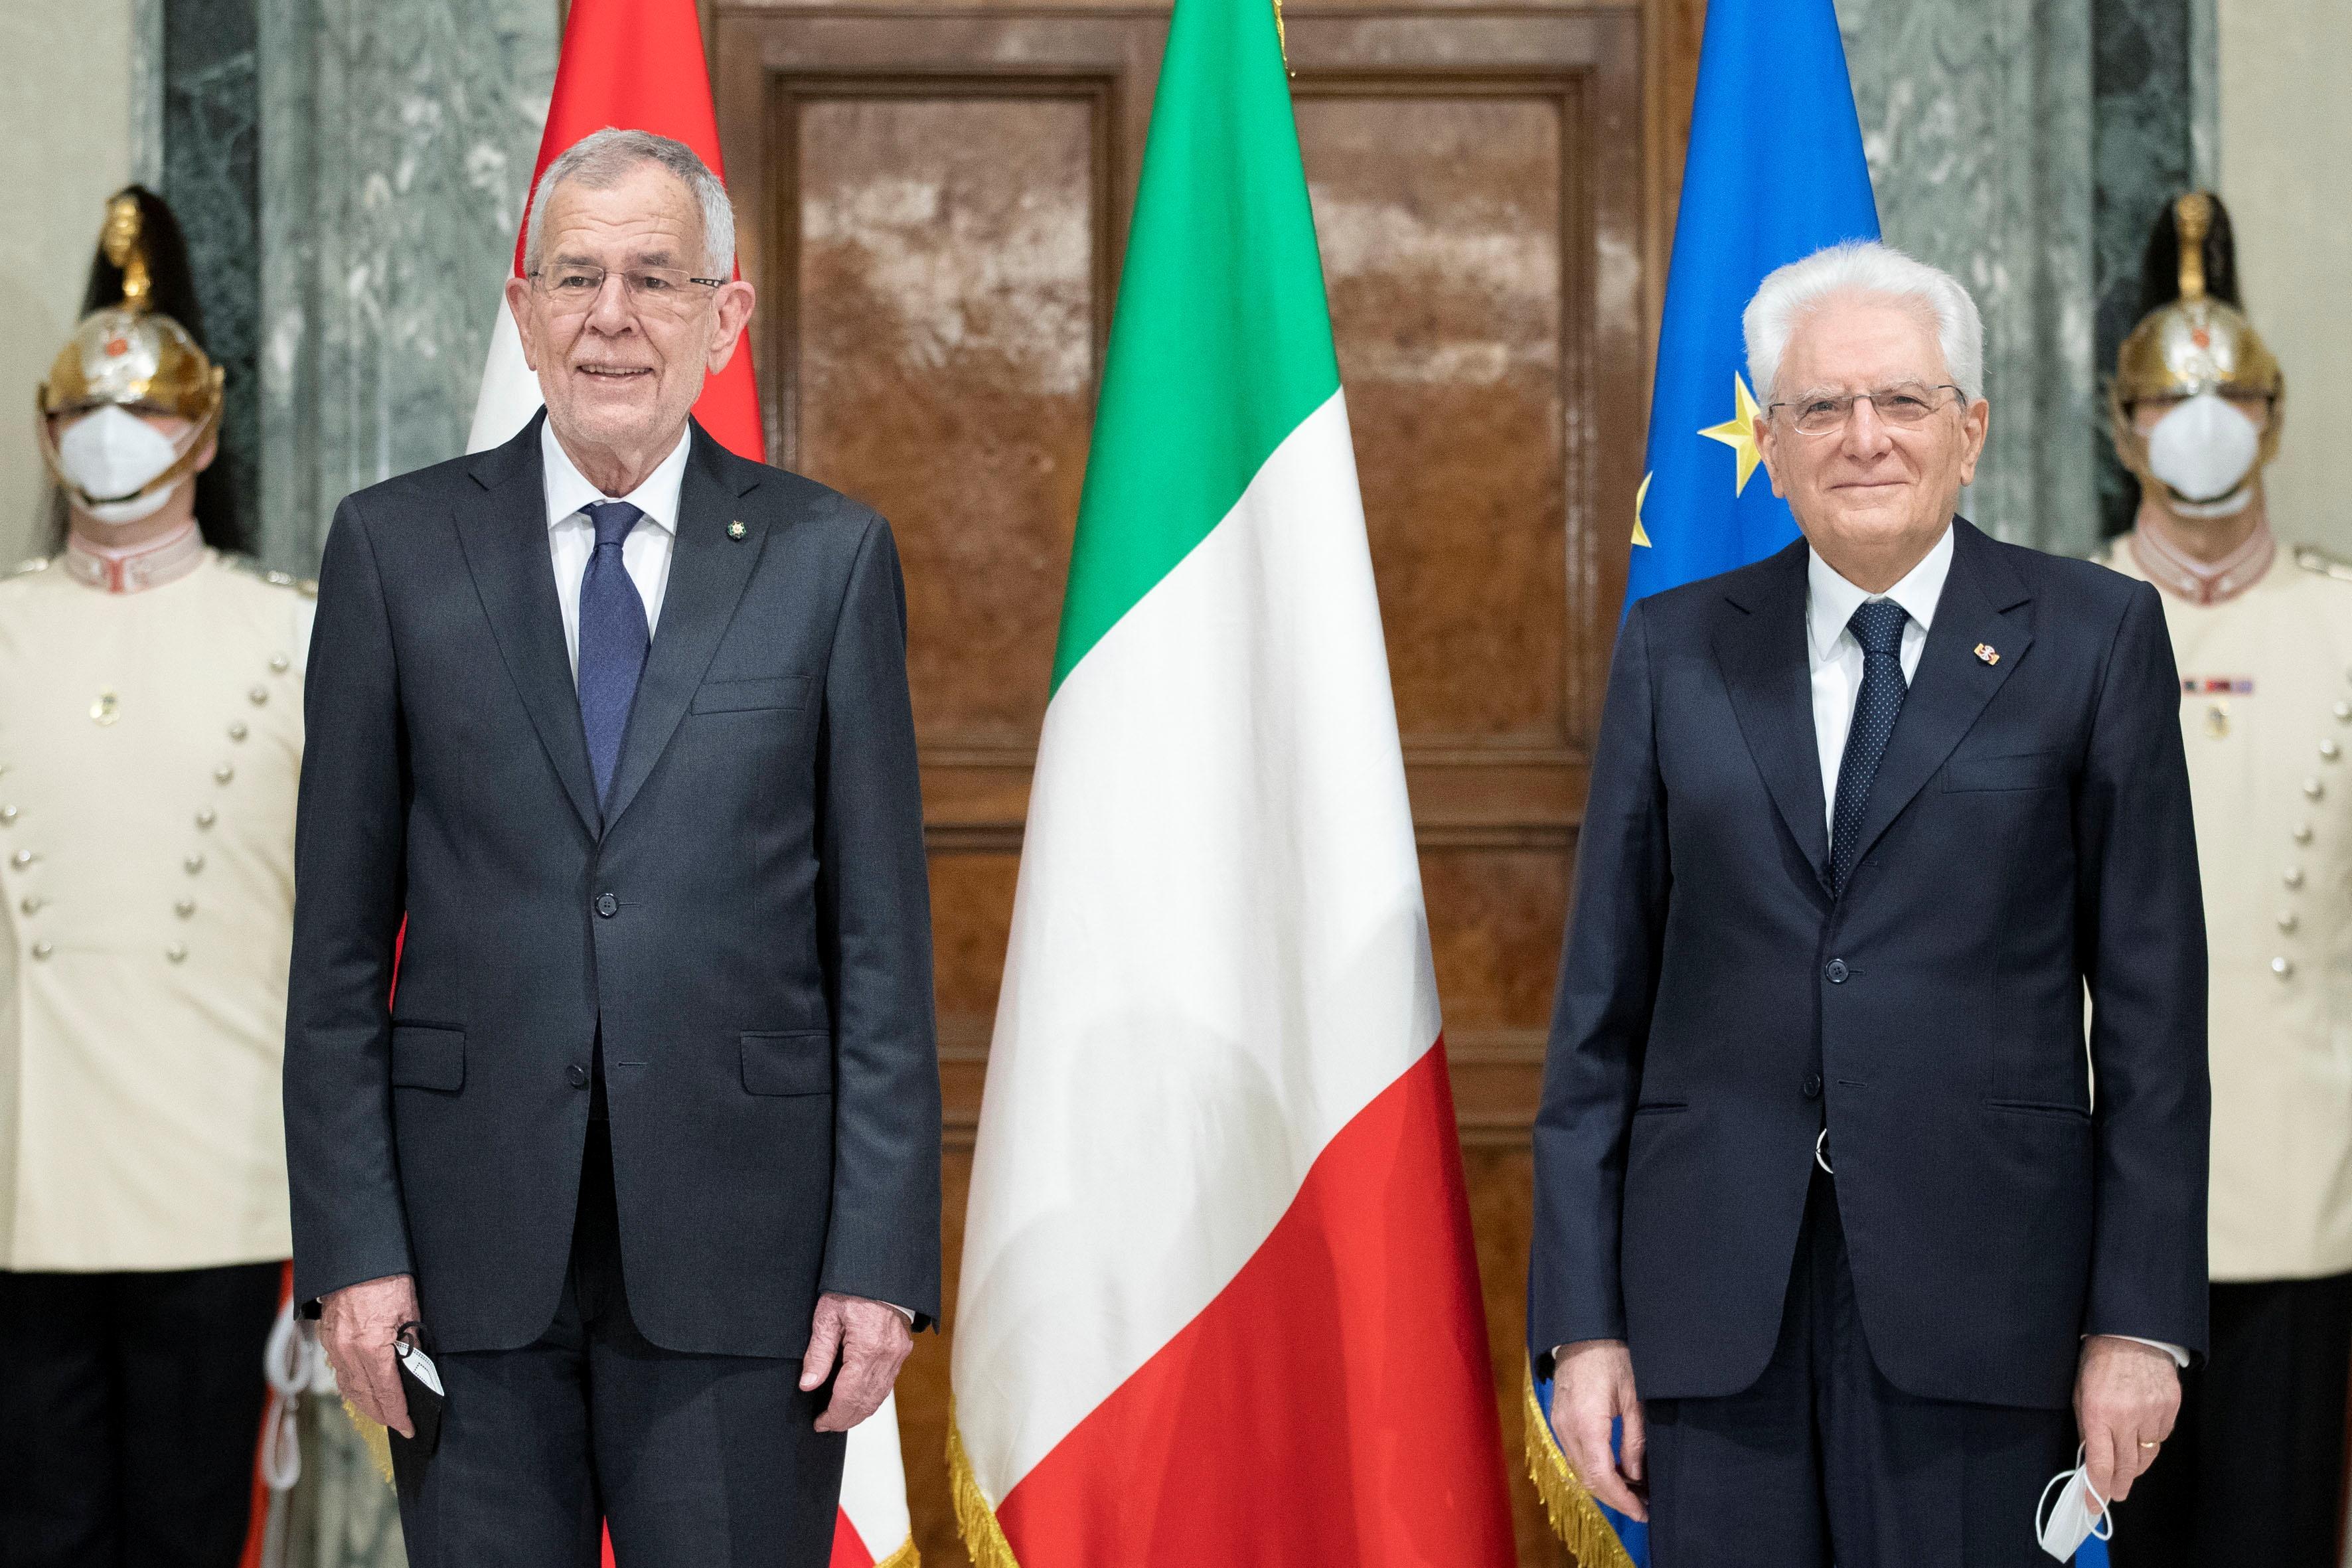 Italy's President Mattarella and Austria's President Van der Bellen meet in Rome